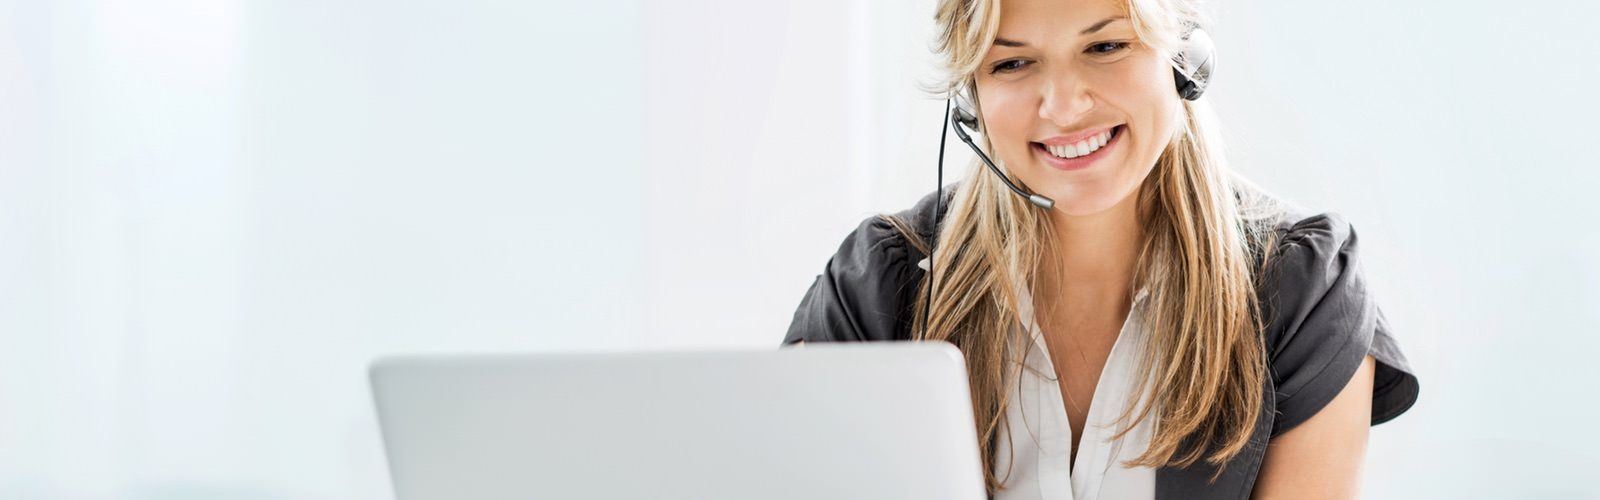 Telefonistin am Computer